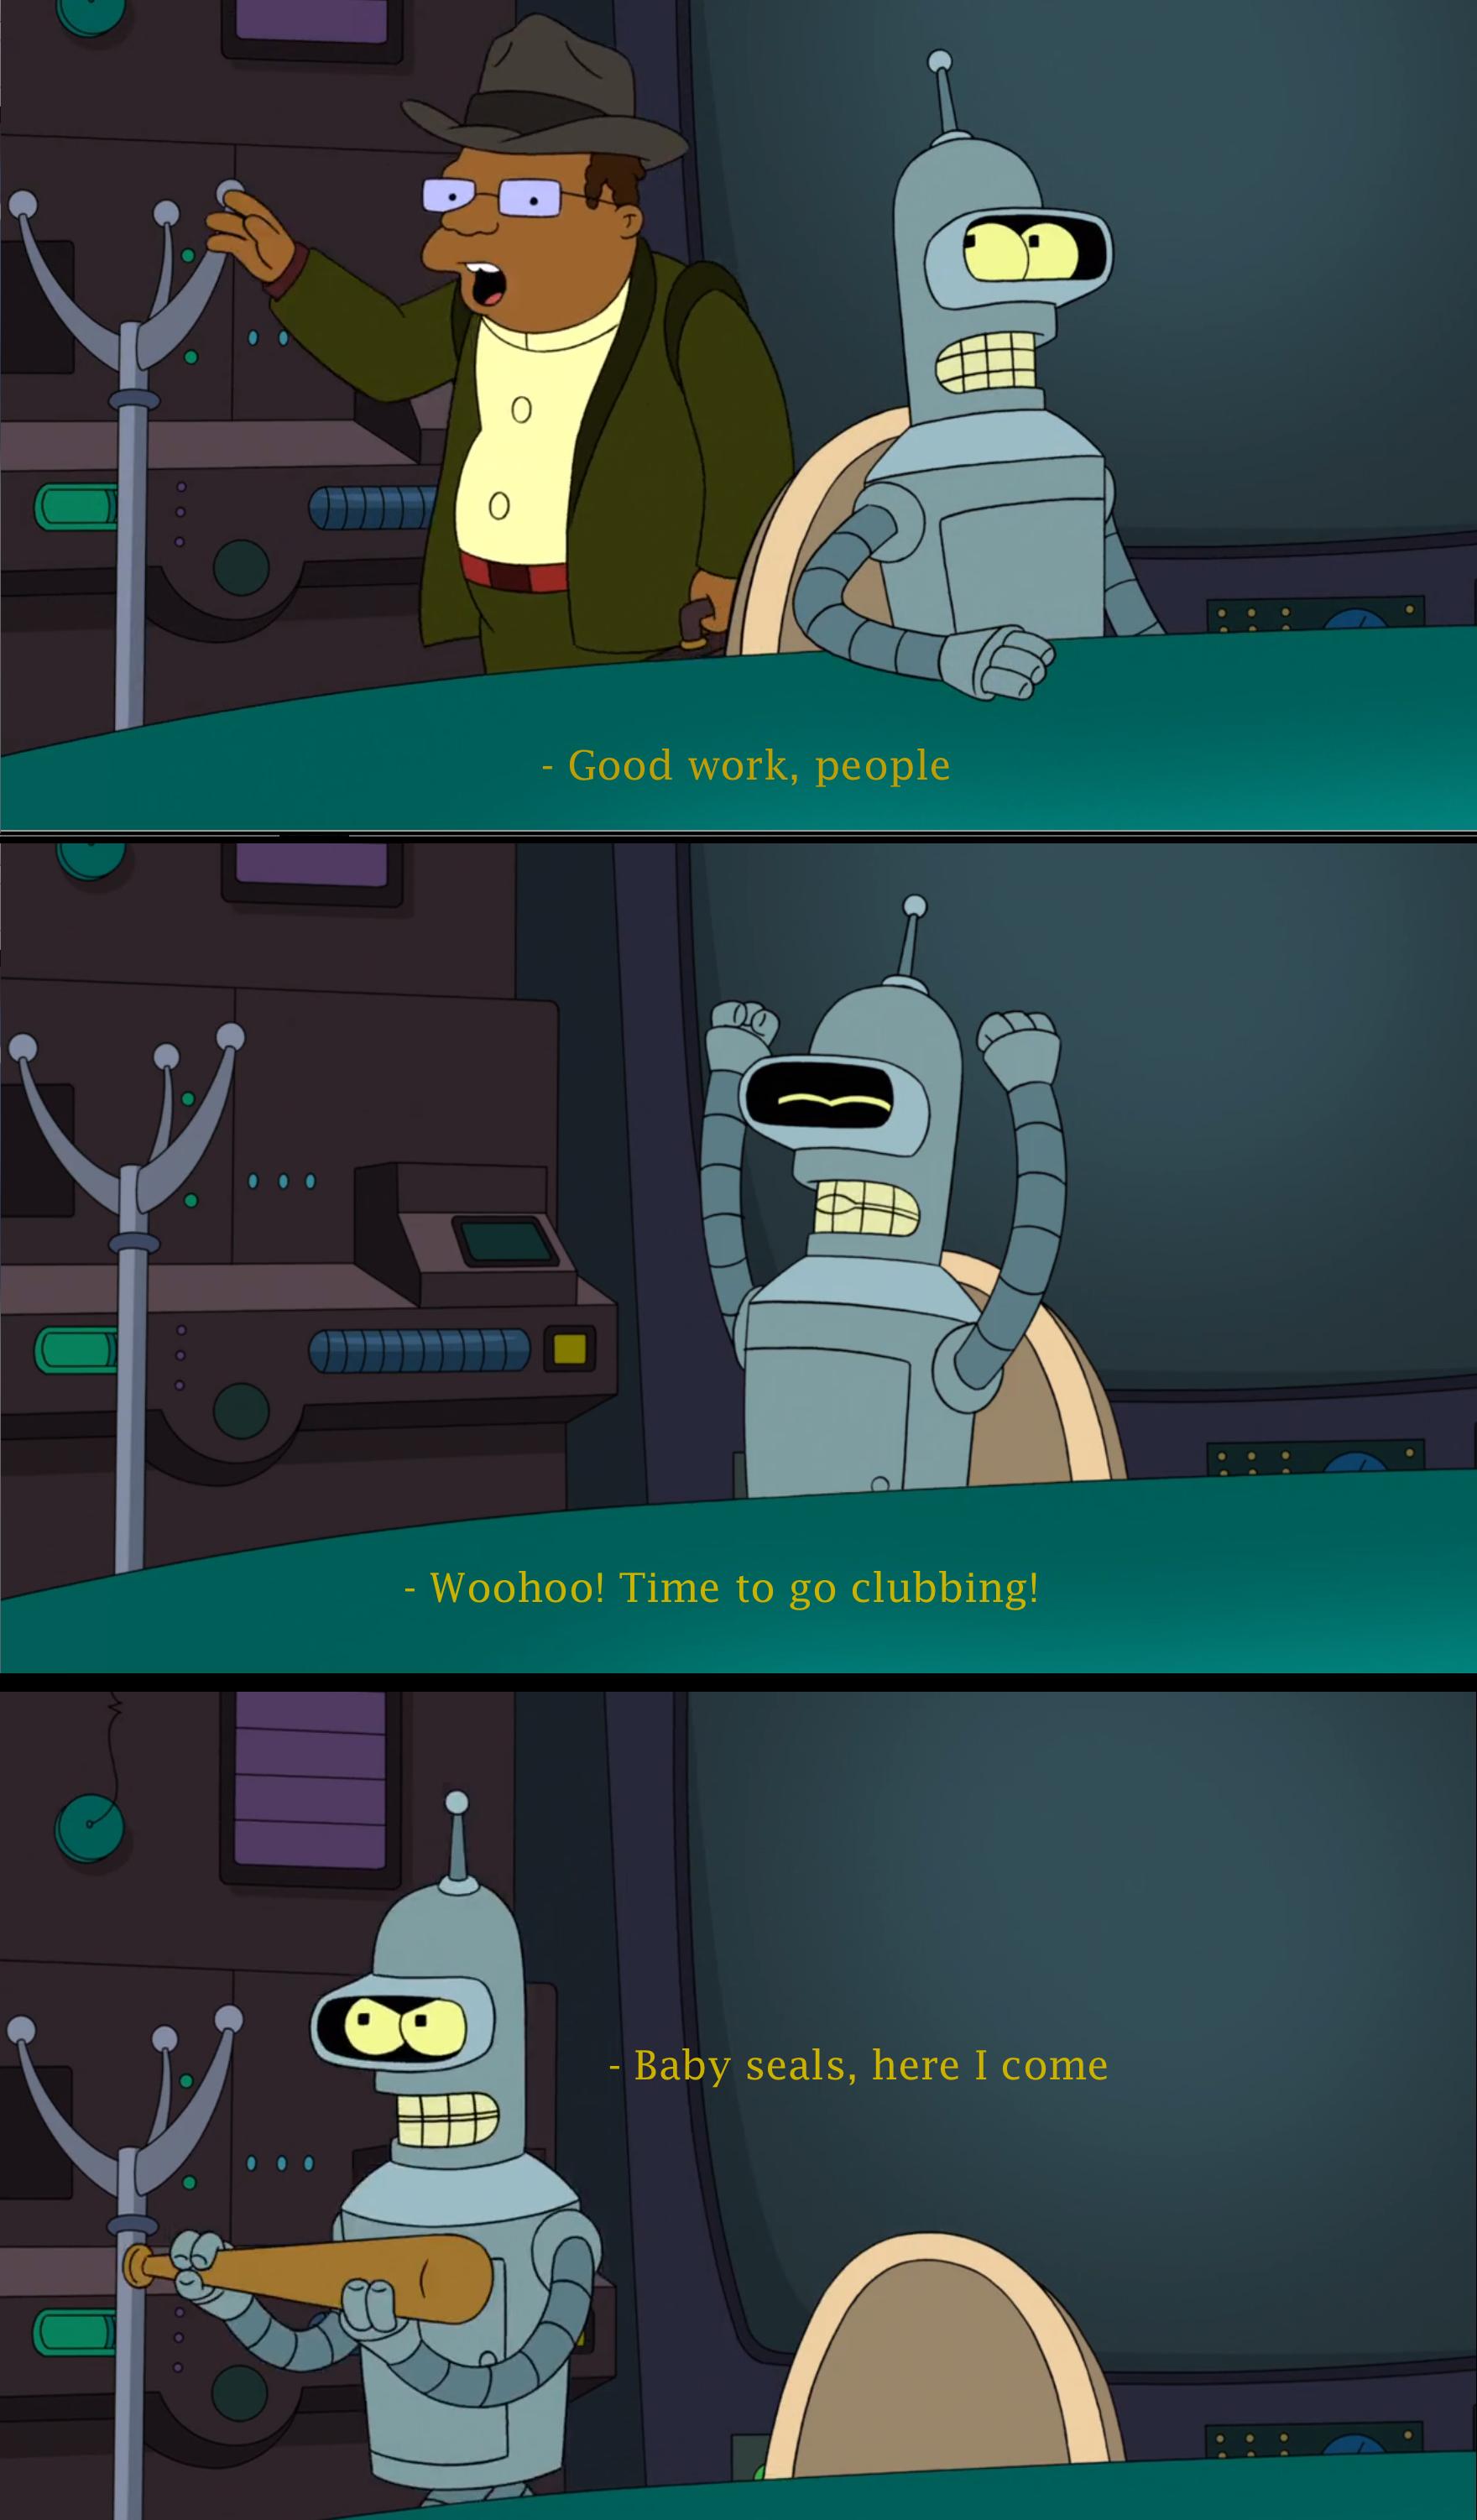 When Bender gets off work. .